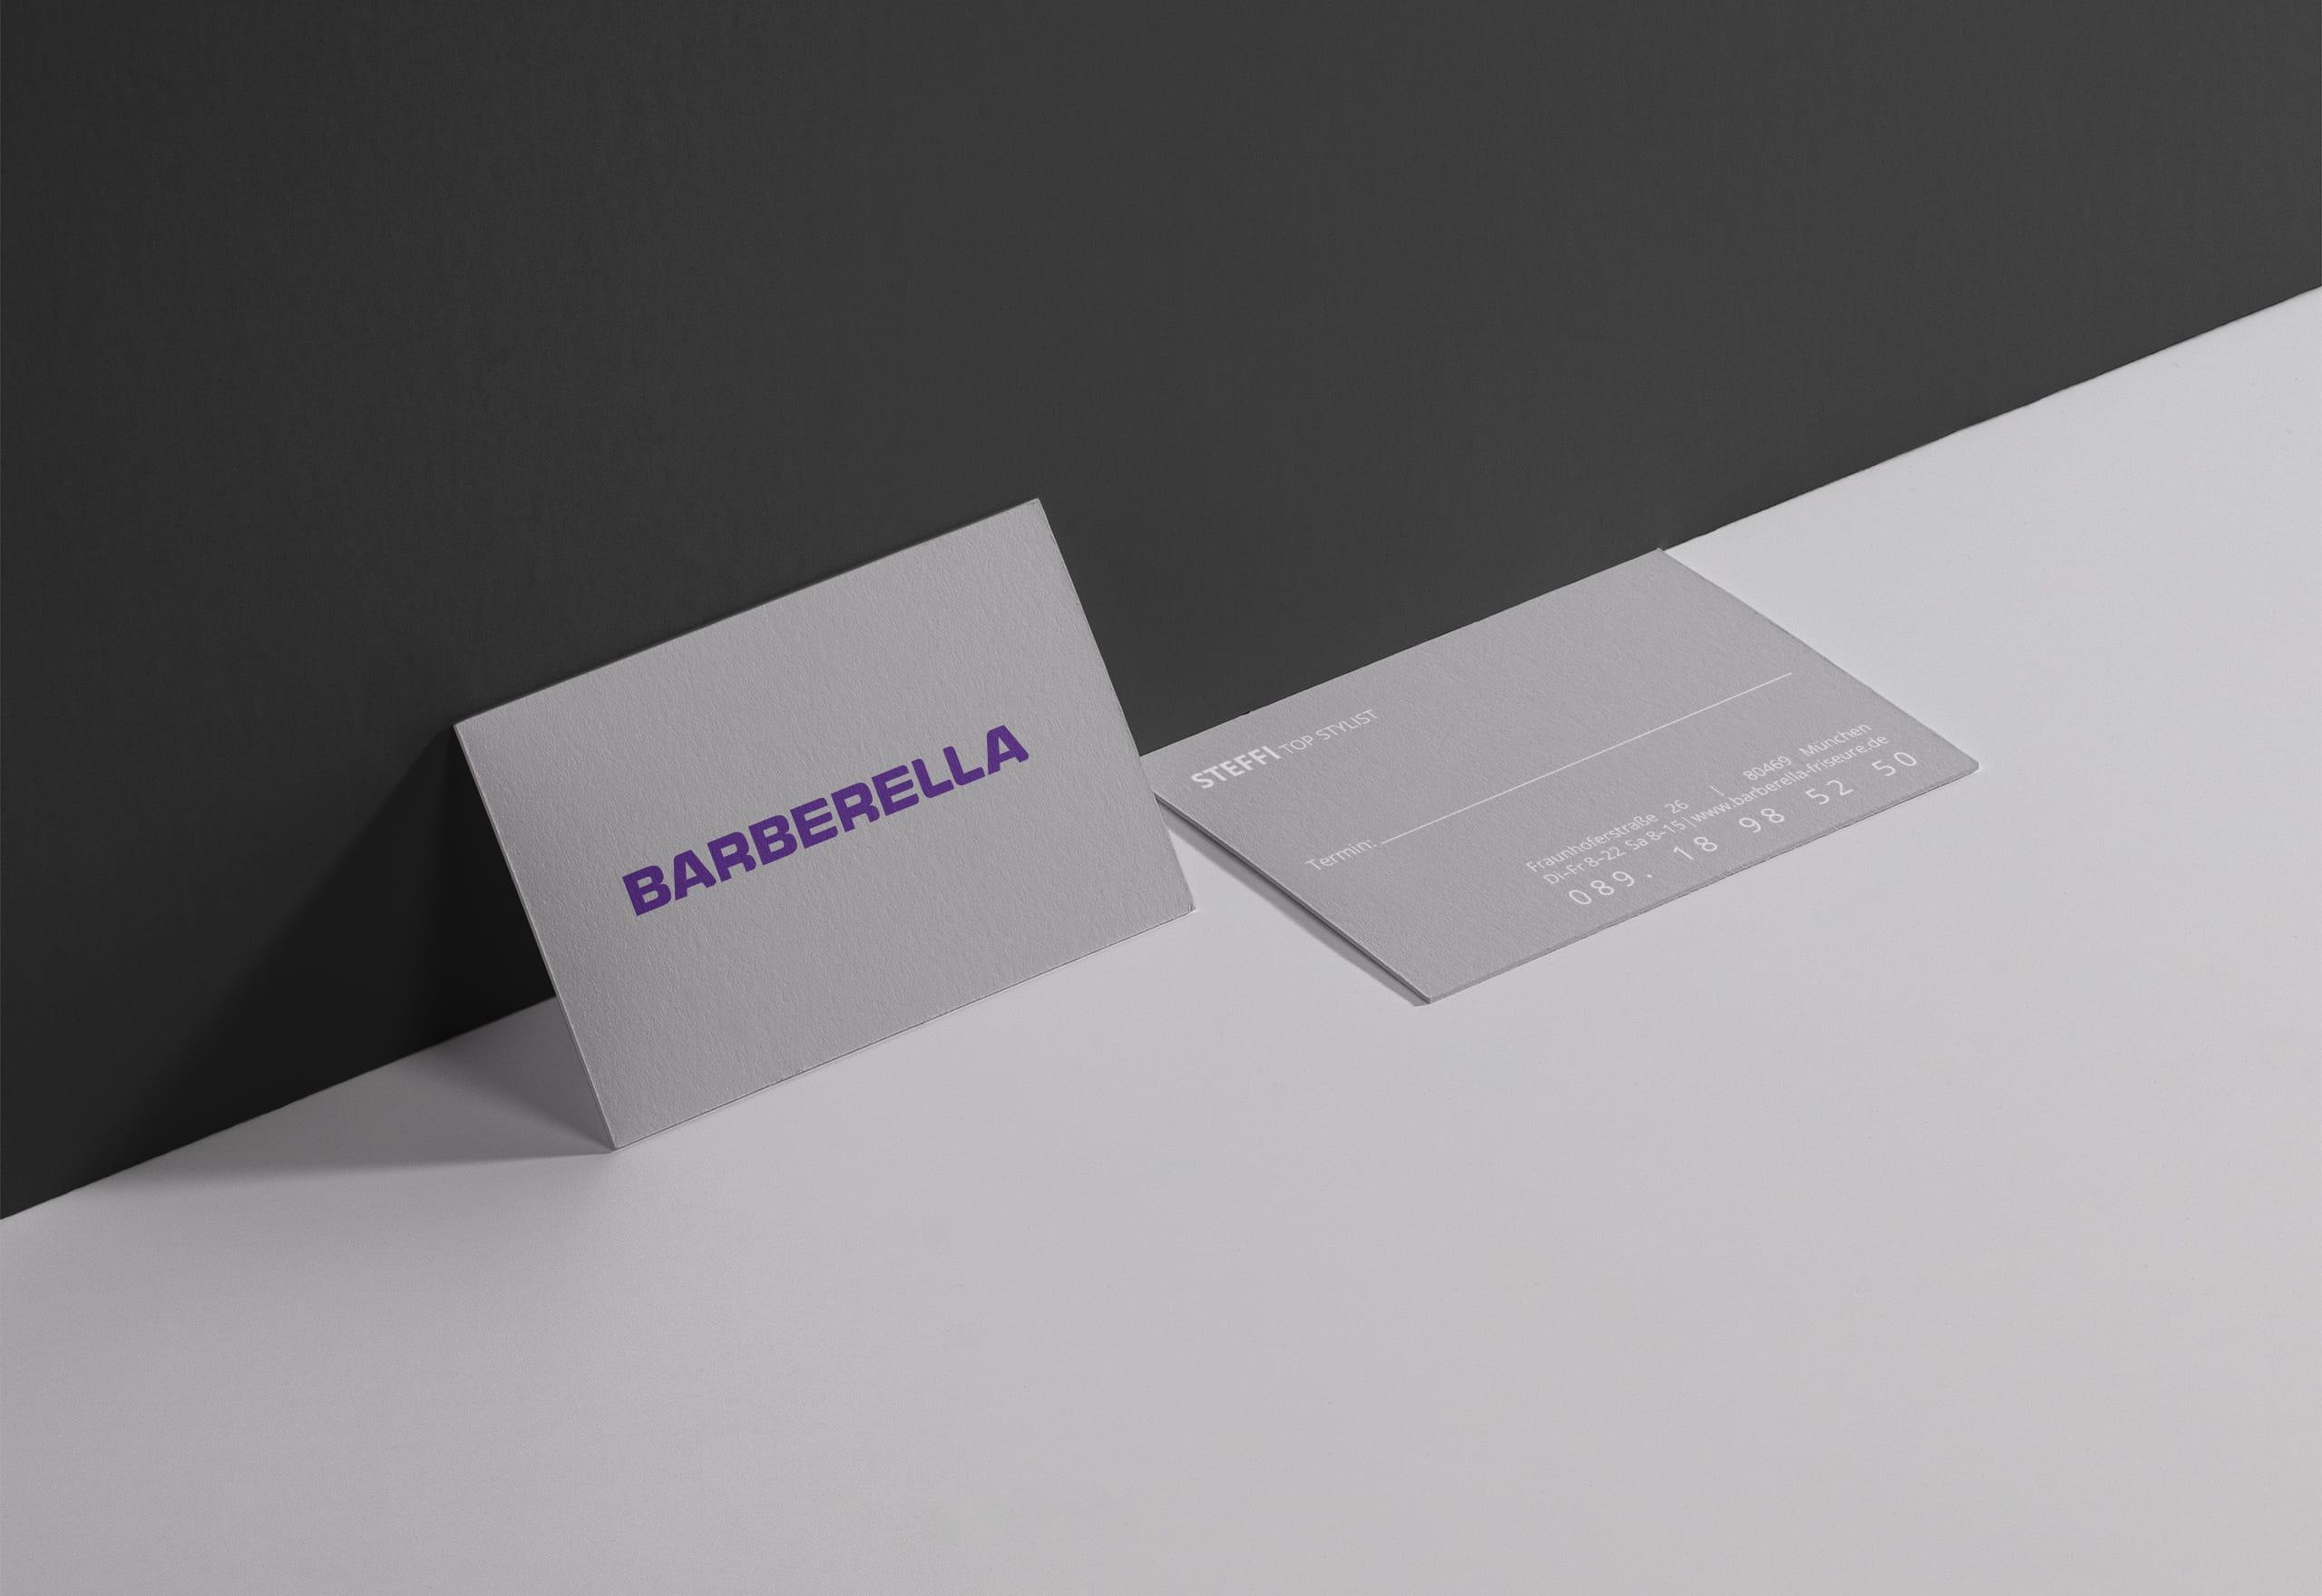 Design Barberella Friseure